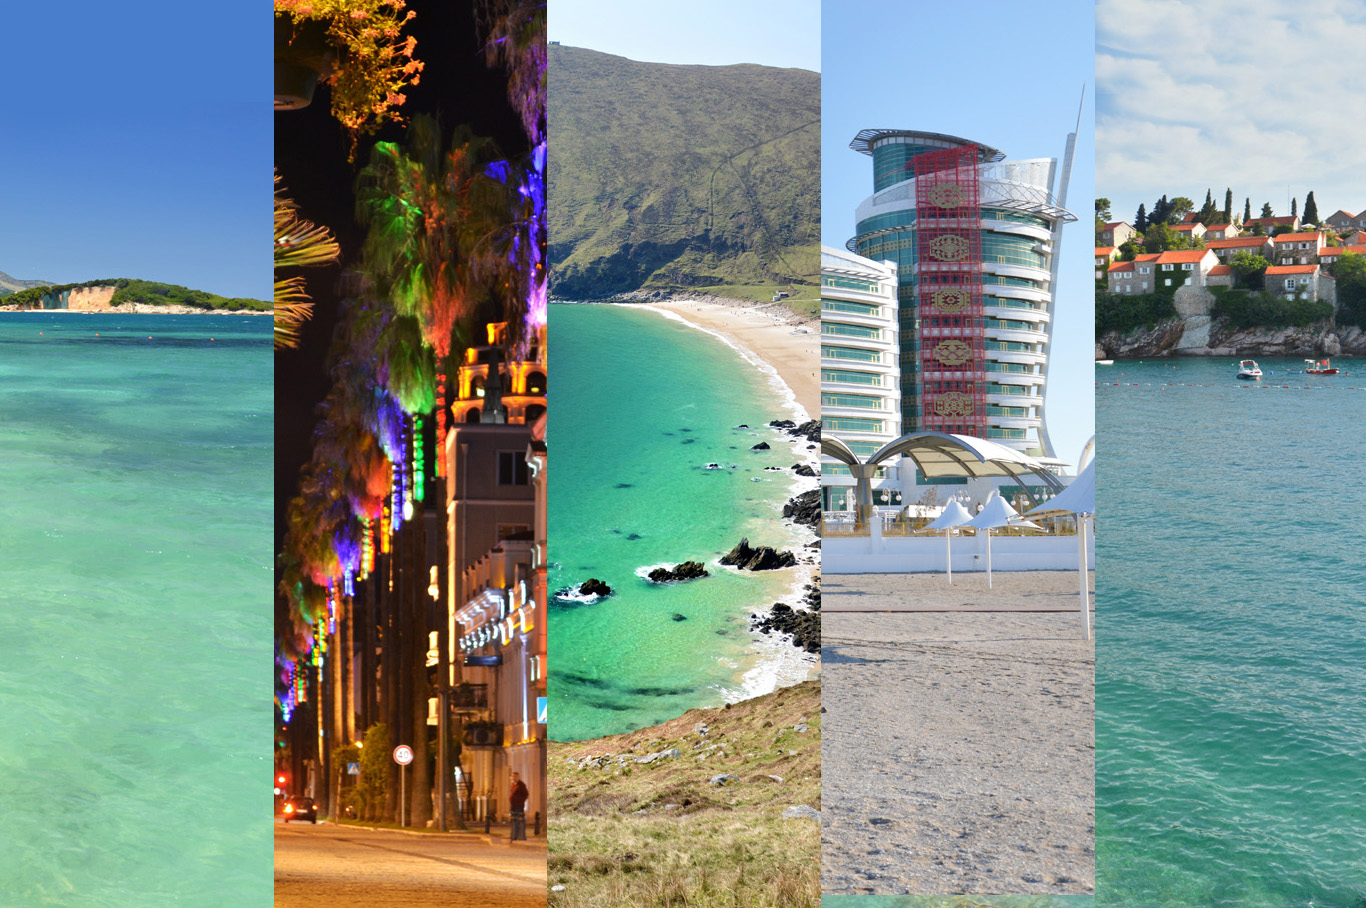 10 Beautiful Beaches And Coastal Towns You've Never Heard